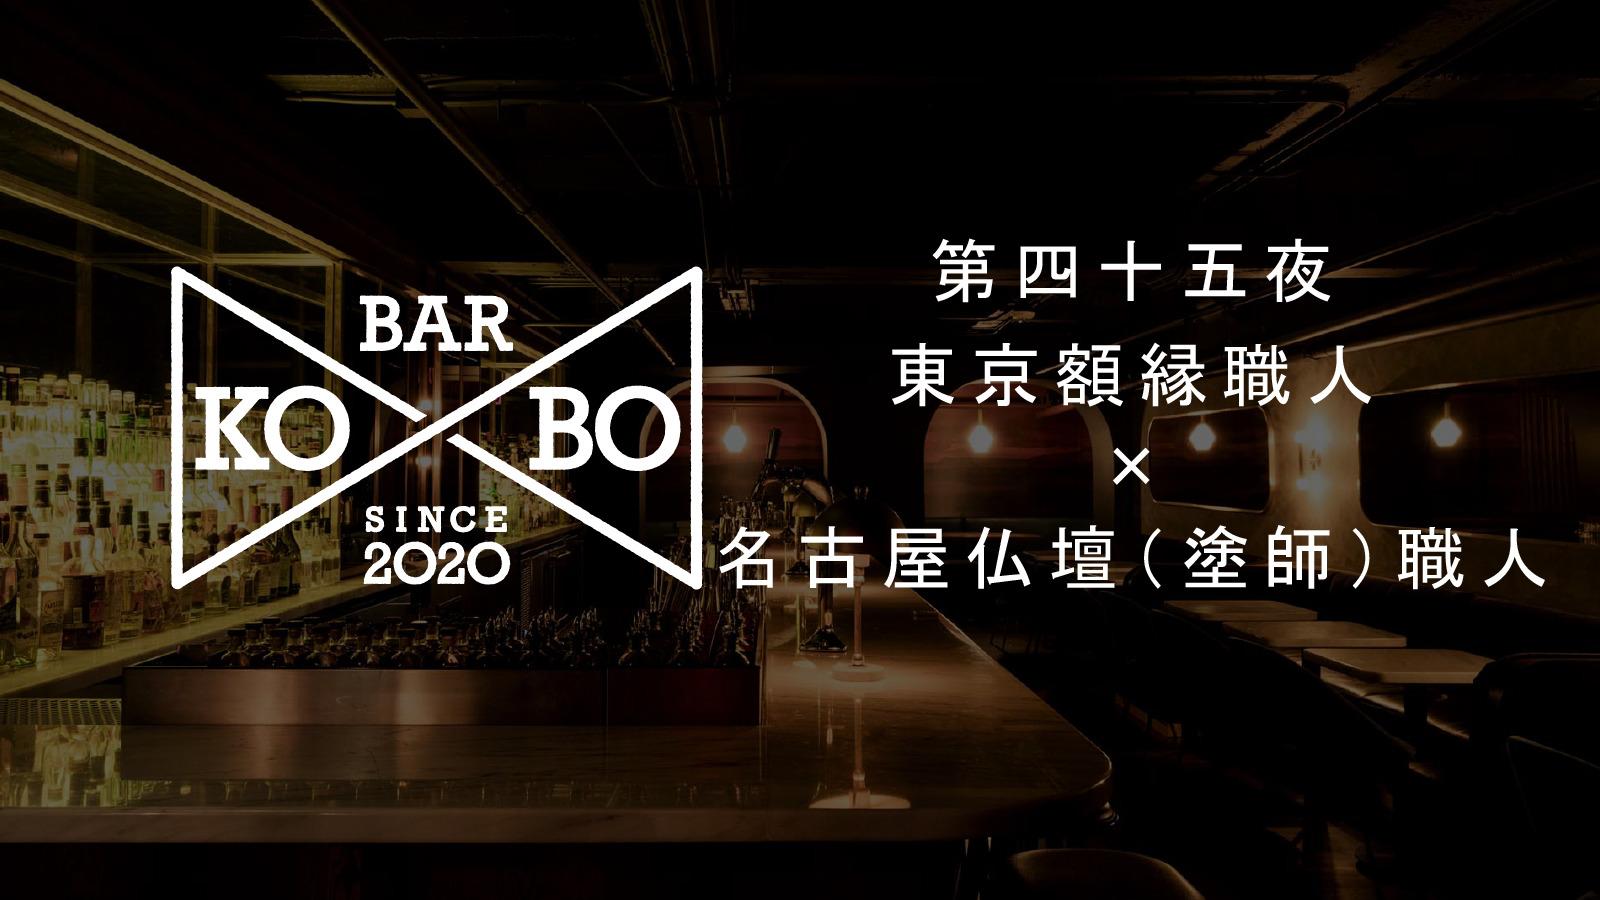 【Bar KO-BO 第四十五夜】東京額縁職人×名古屋仏壇(塗師)職人